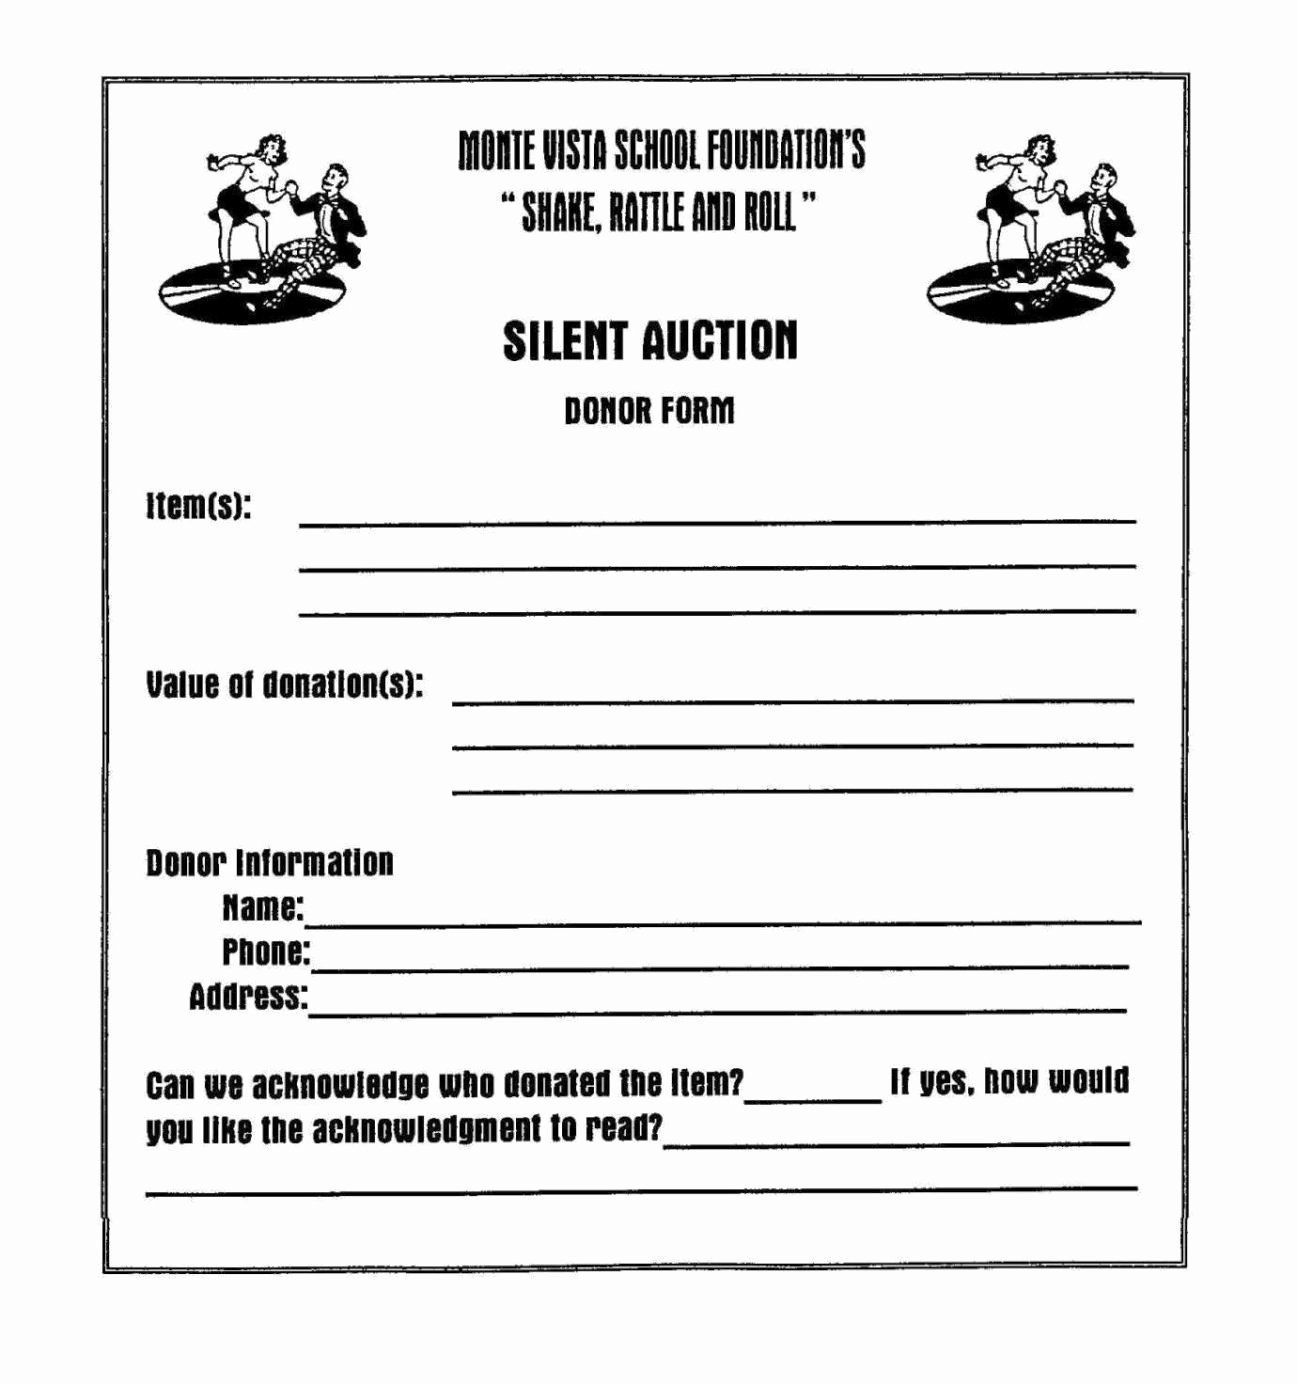 Silent Auction Donation Form Template Beautiful Silent Auction Donation Form Template Sam Silent Auction Donations Auction Donations Sample Fundraising Letters